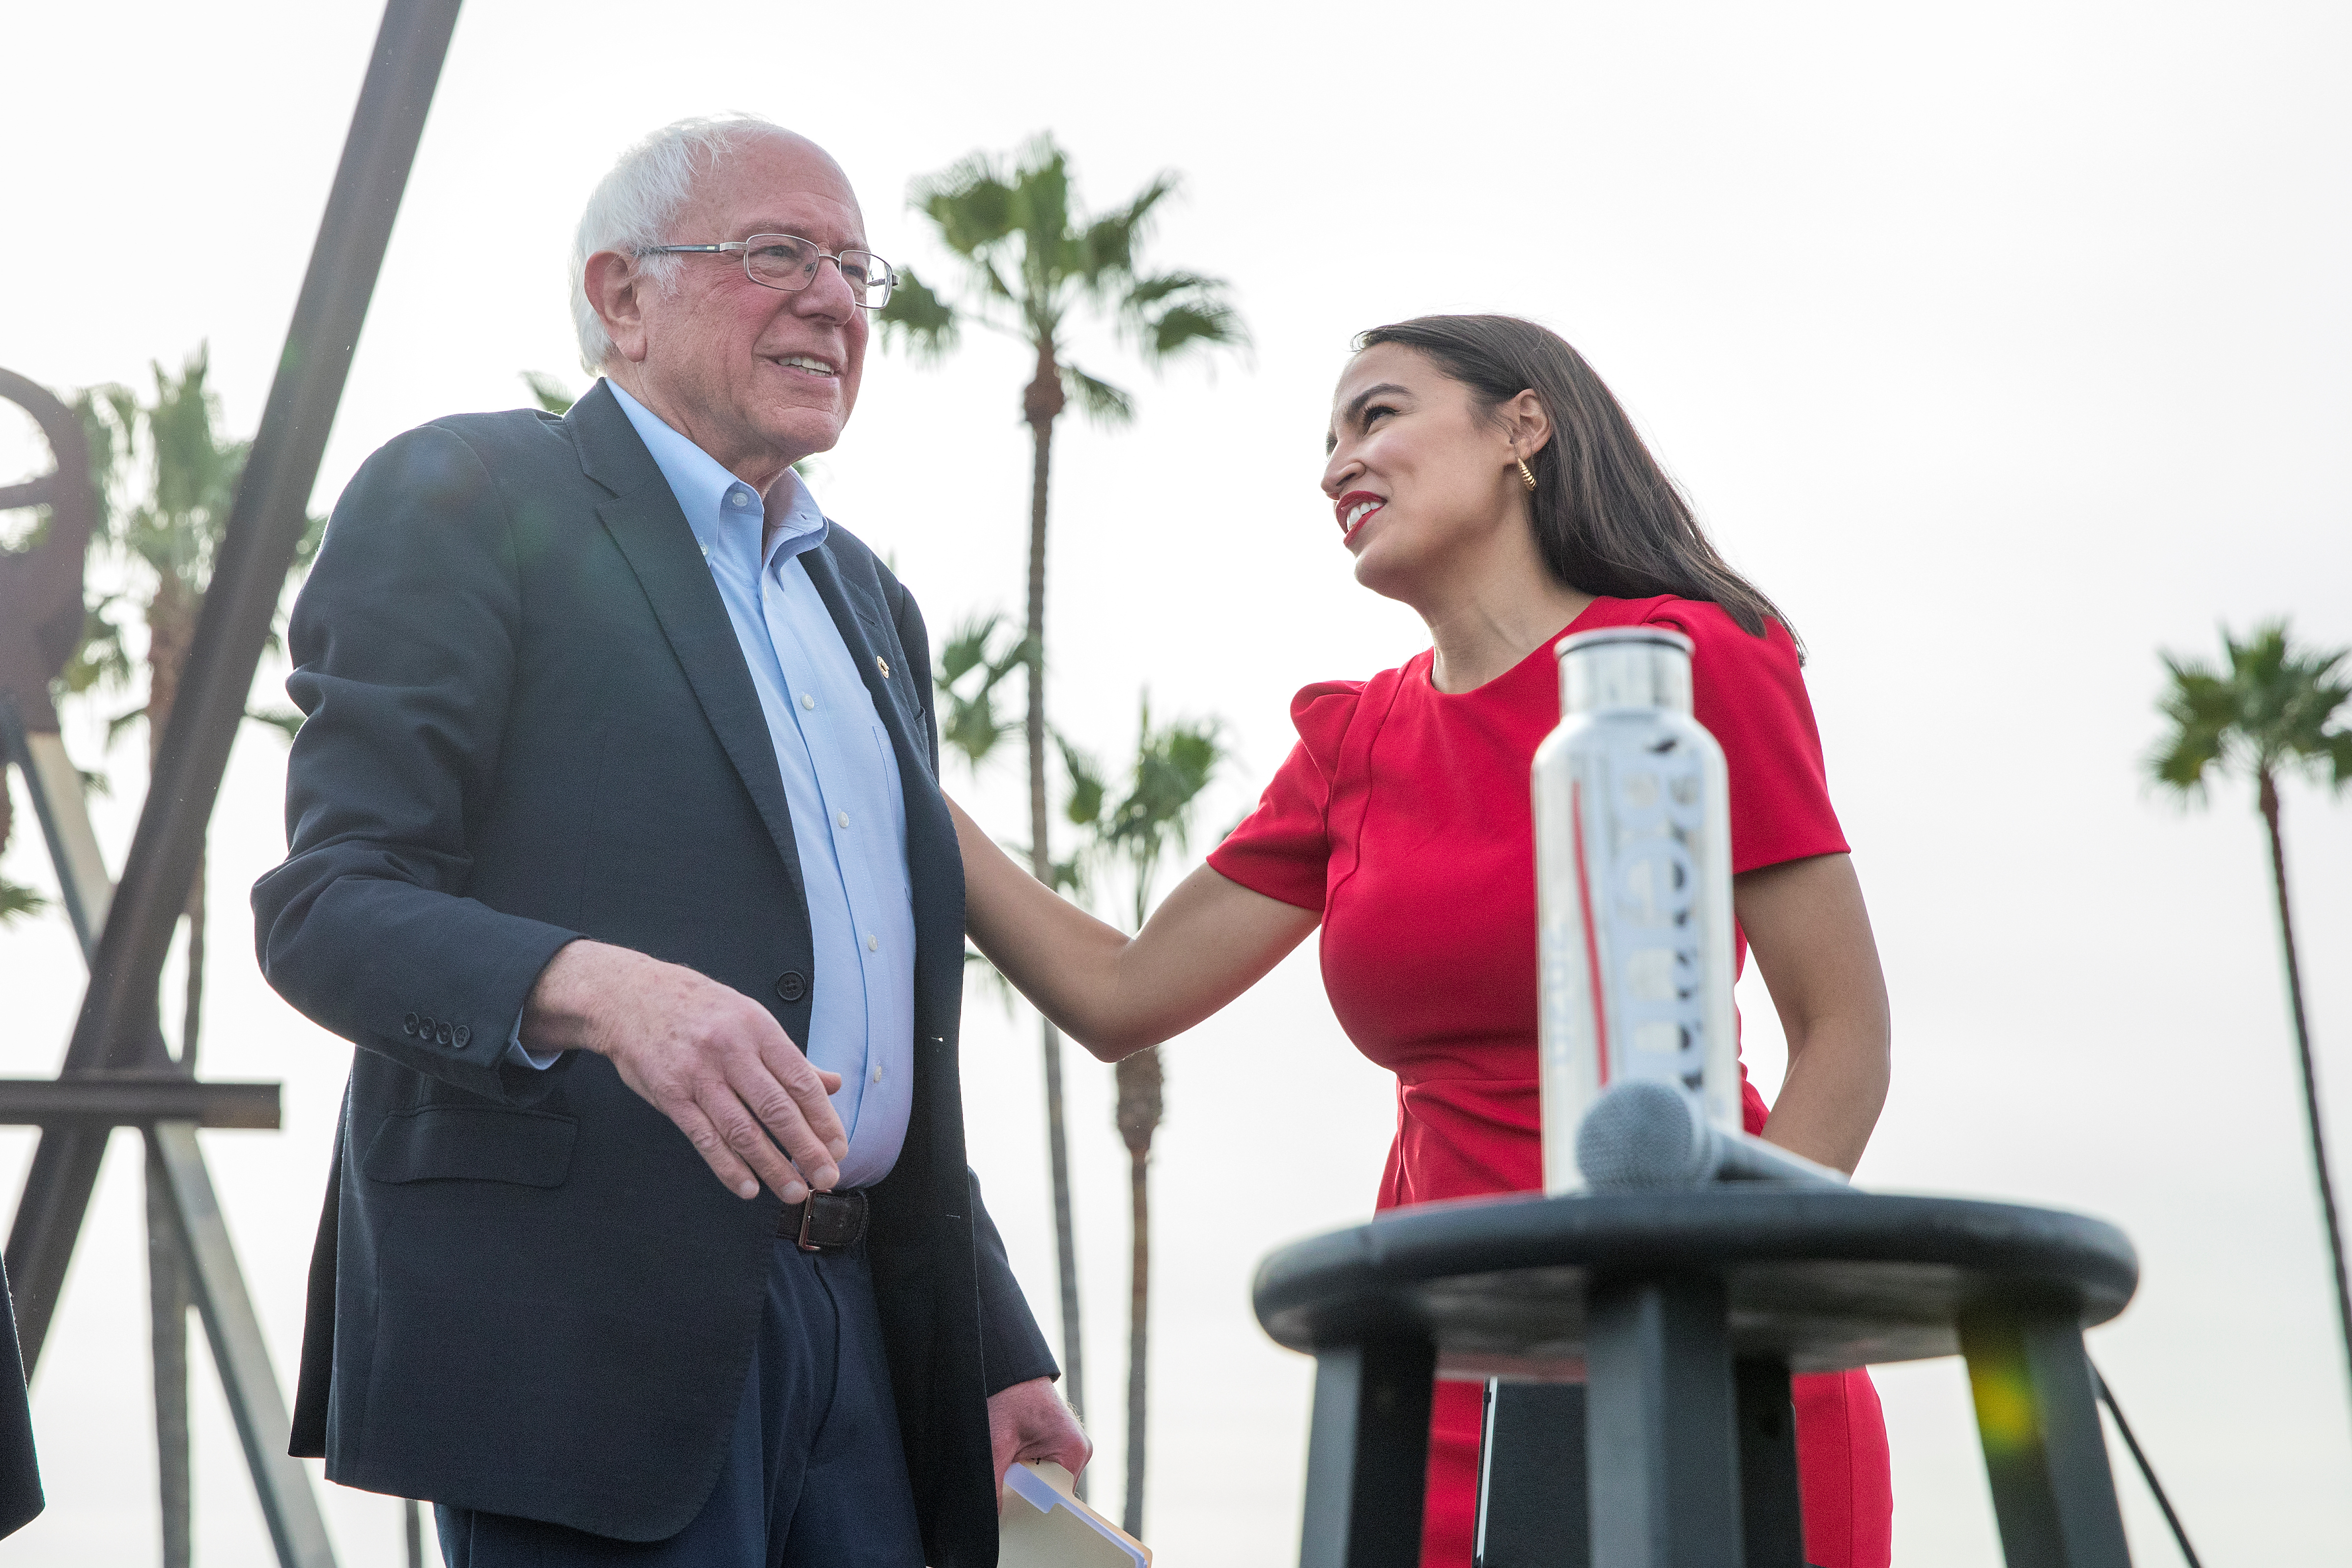 U.S. Senator Bernie Sanders and Representative Alexandria Ocasio-Cortez during a campaign rally at Venice Beach in Los Angeles, California, U.S., Dec. 21, 2019. REUTERS/Monica Almeida